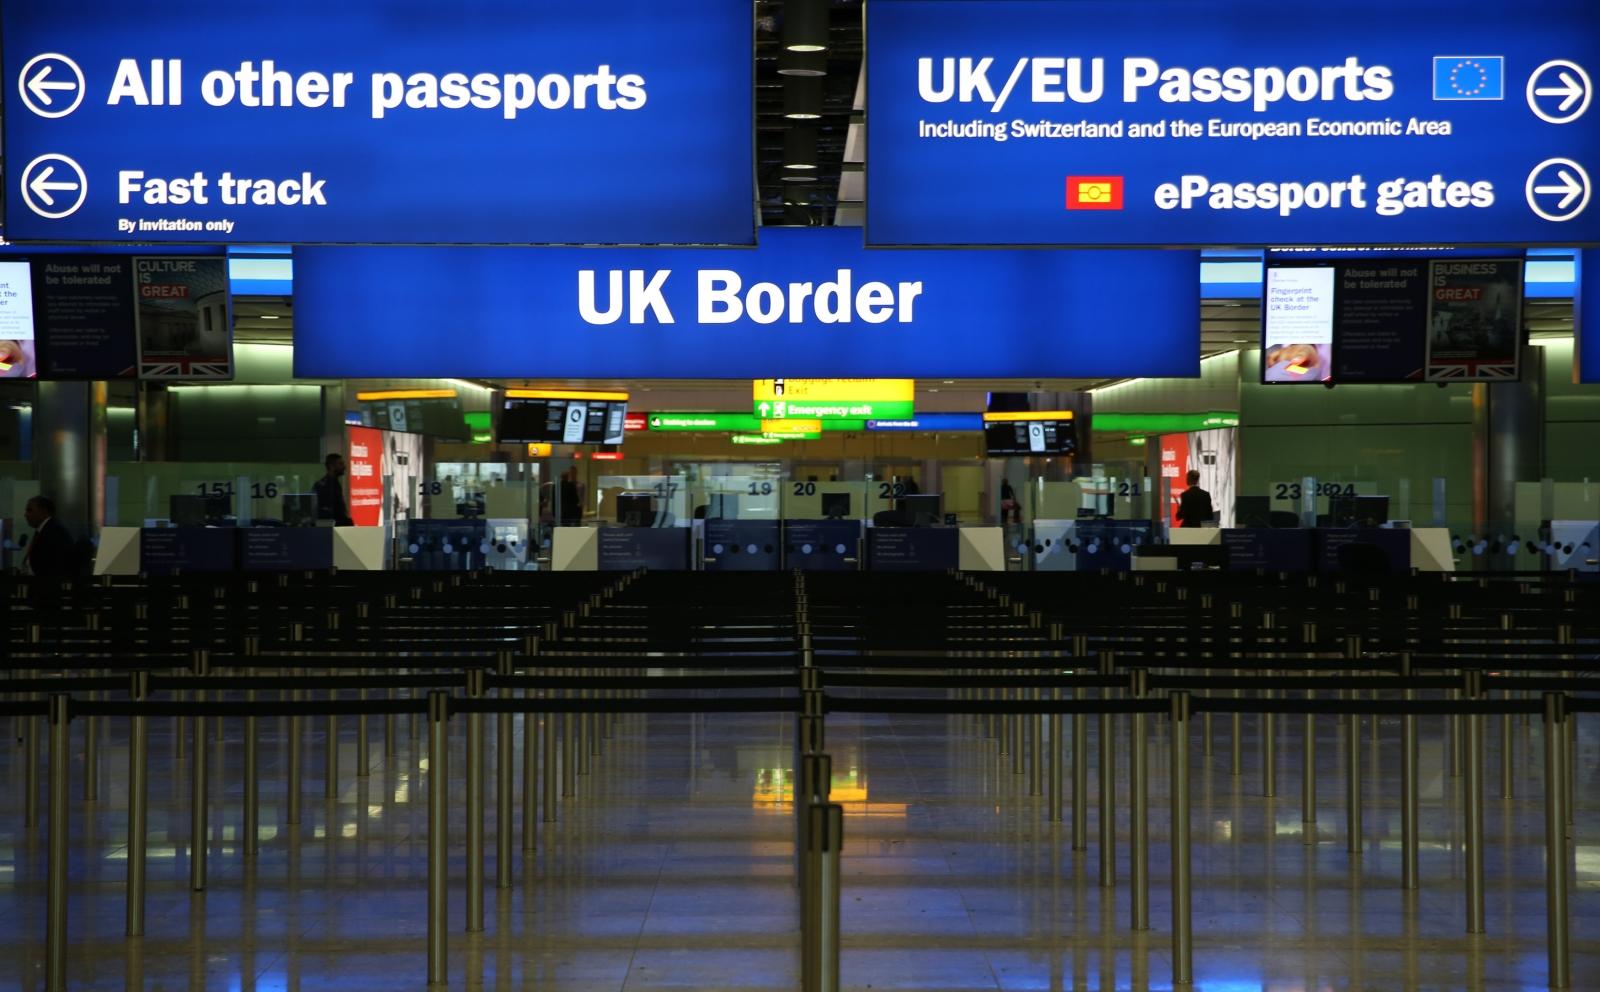 UK border - Heathrow